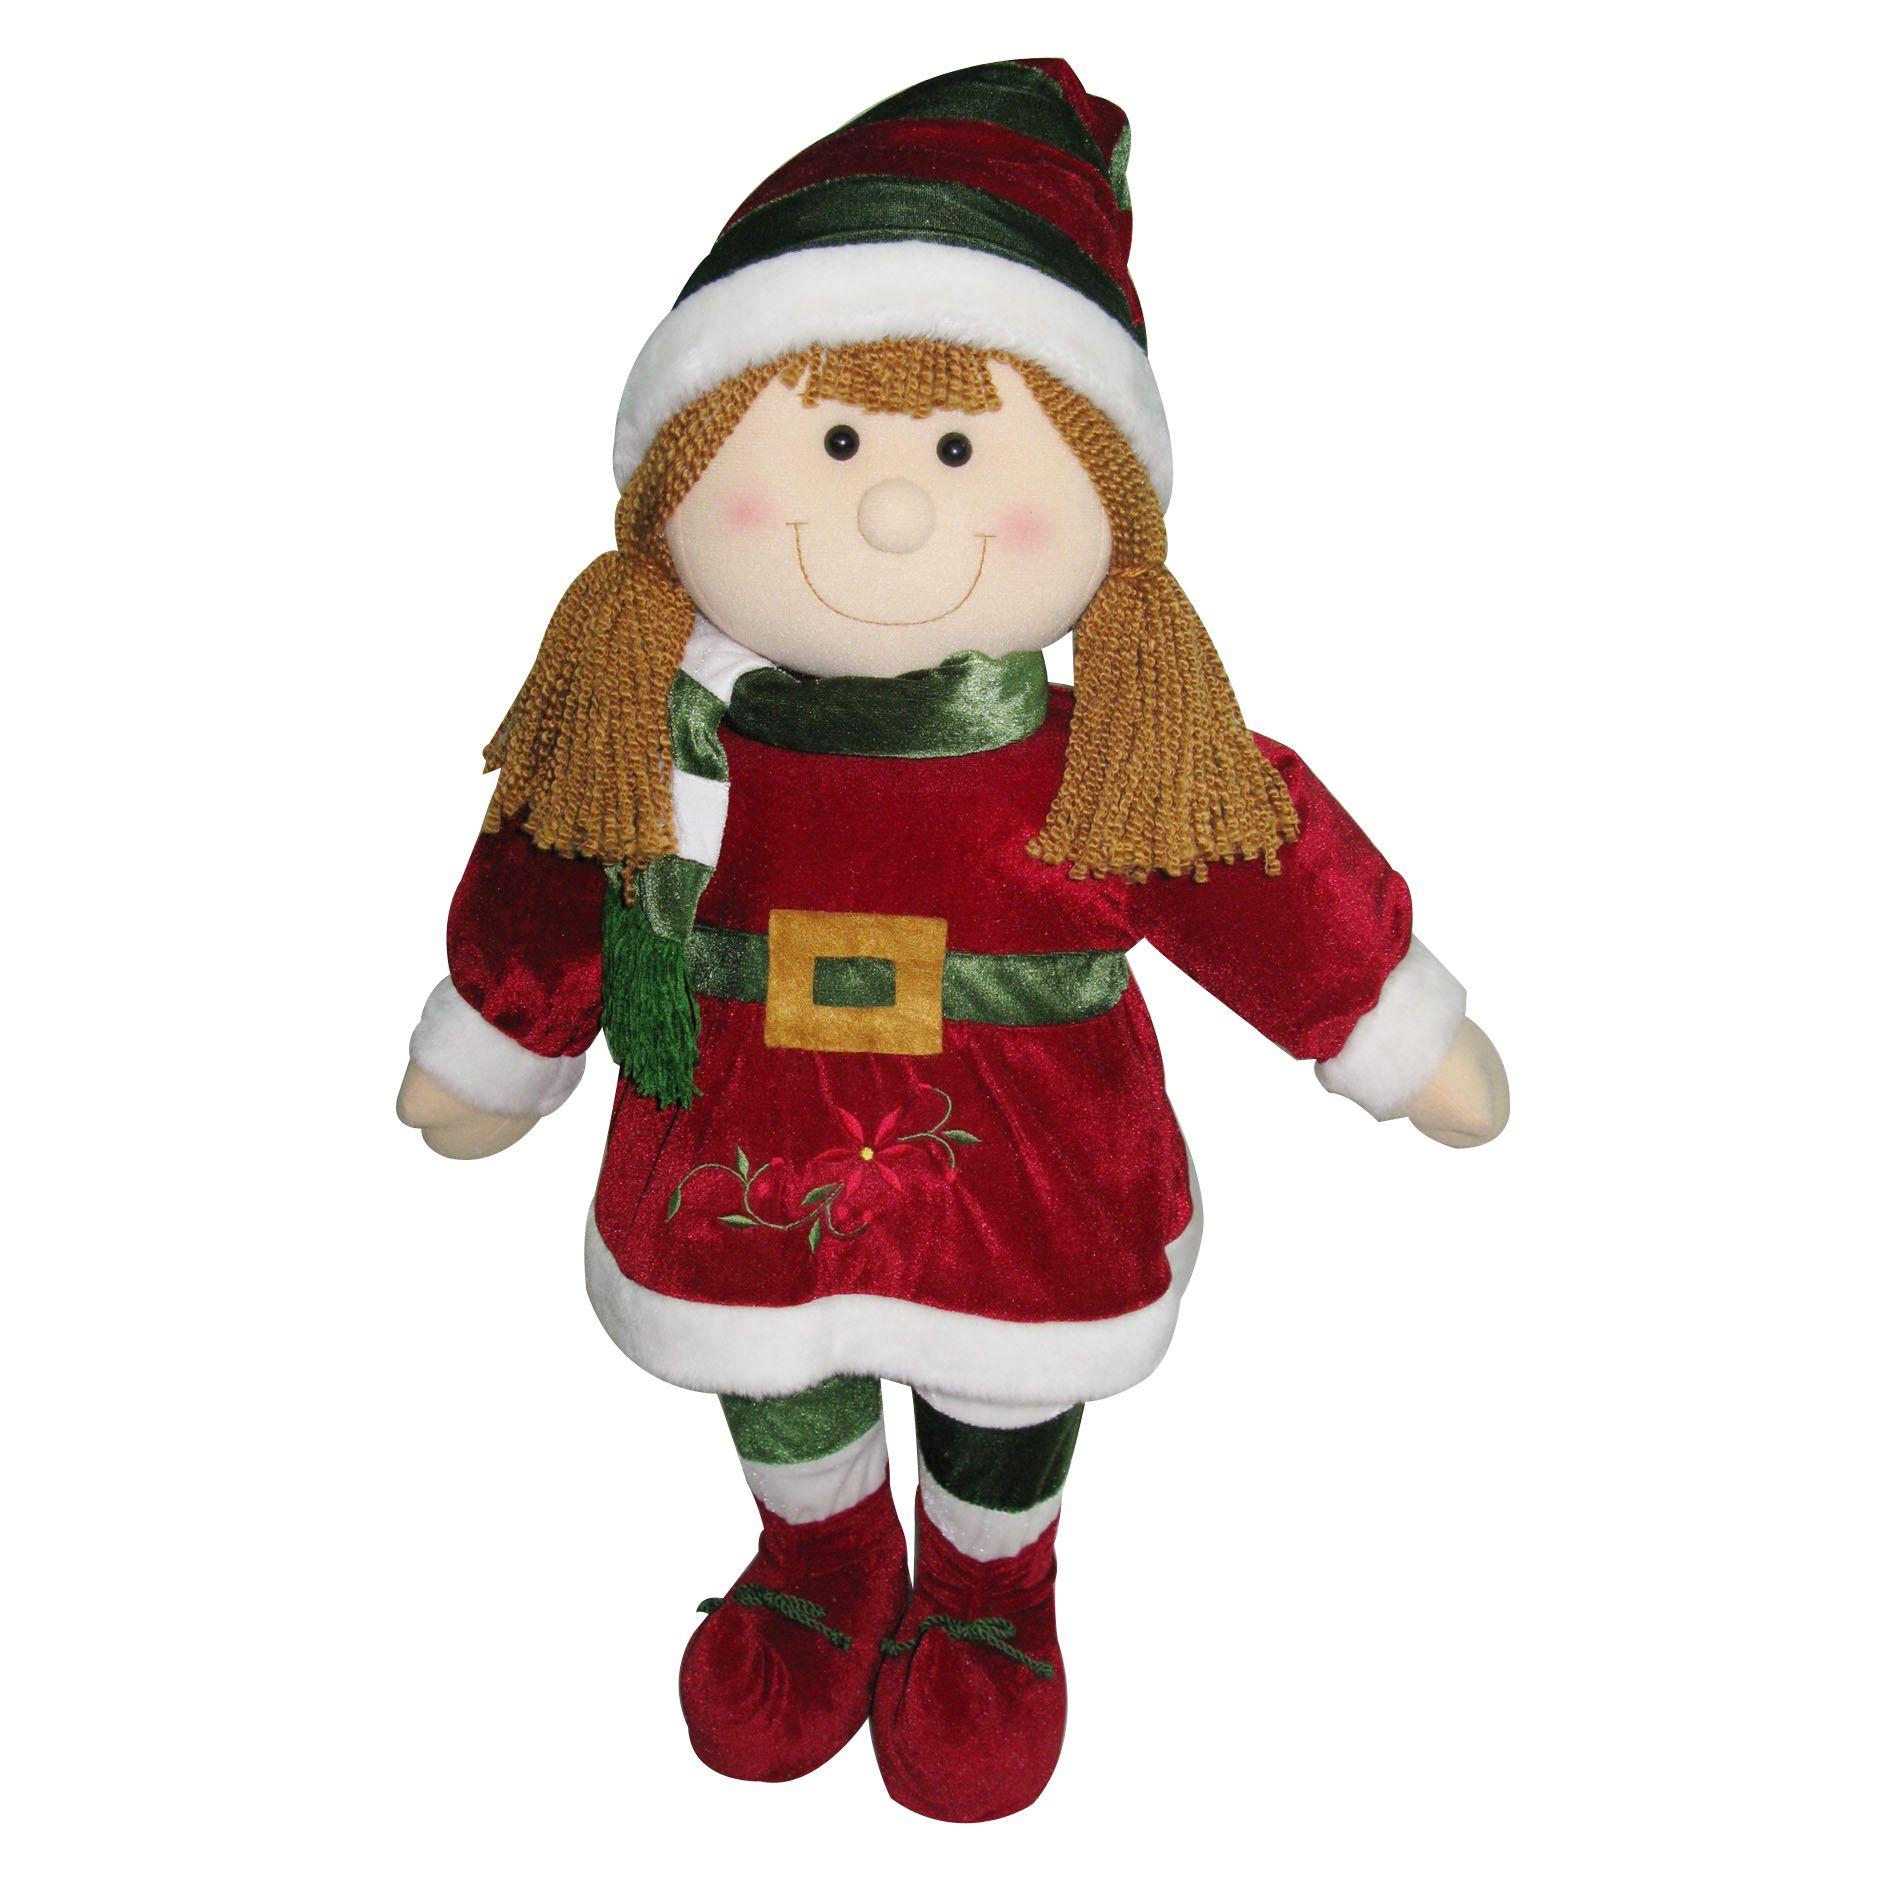 kmart christmas elves - Google Search | Christmas | Pinterest